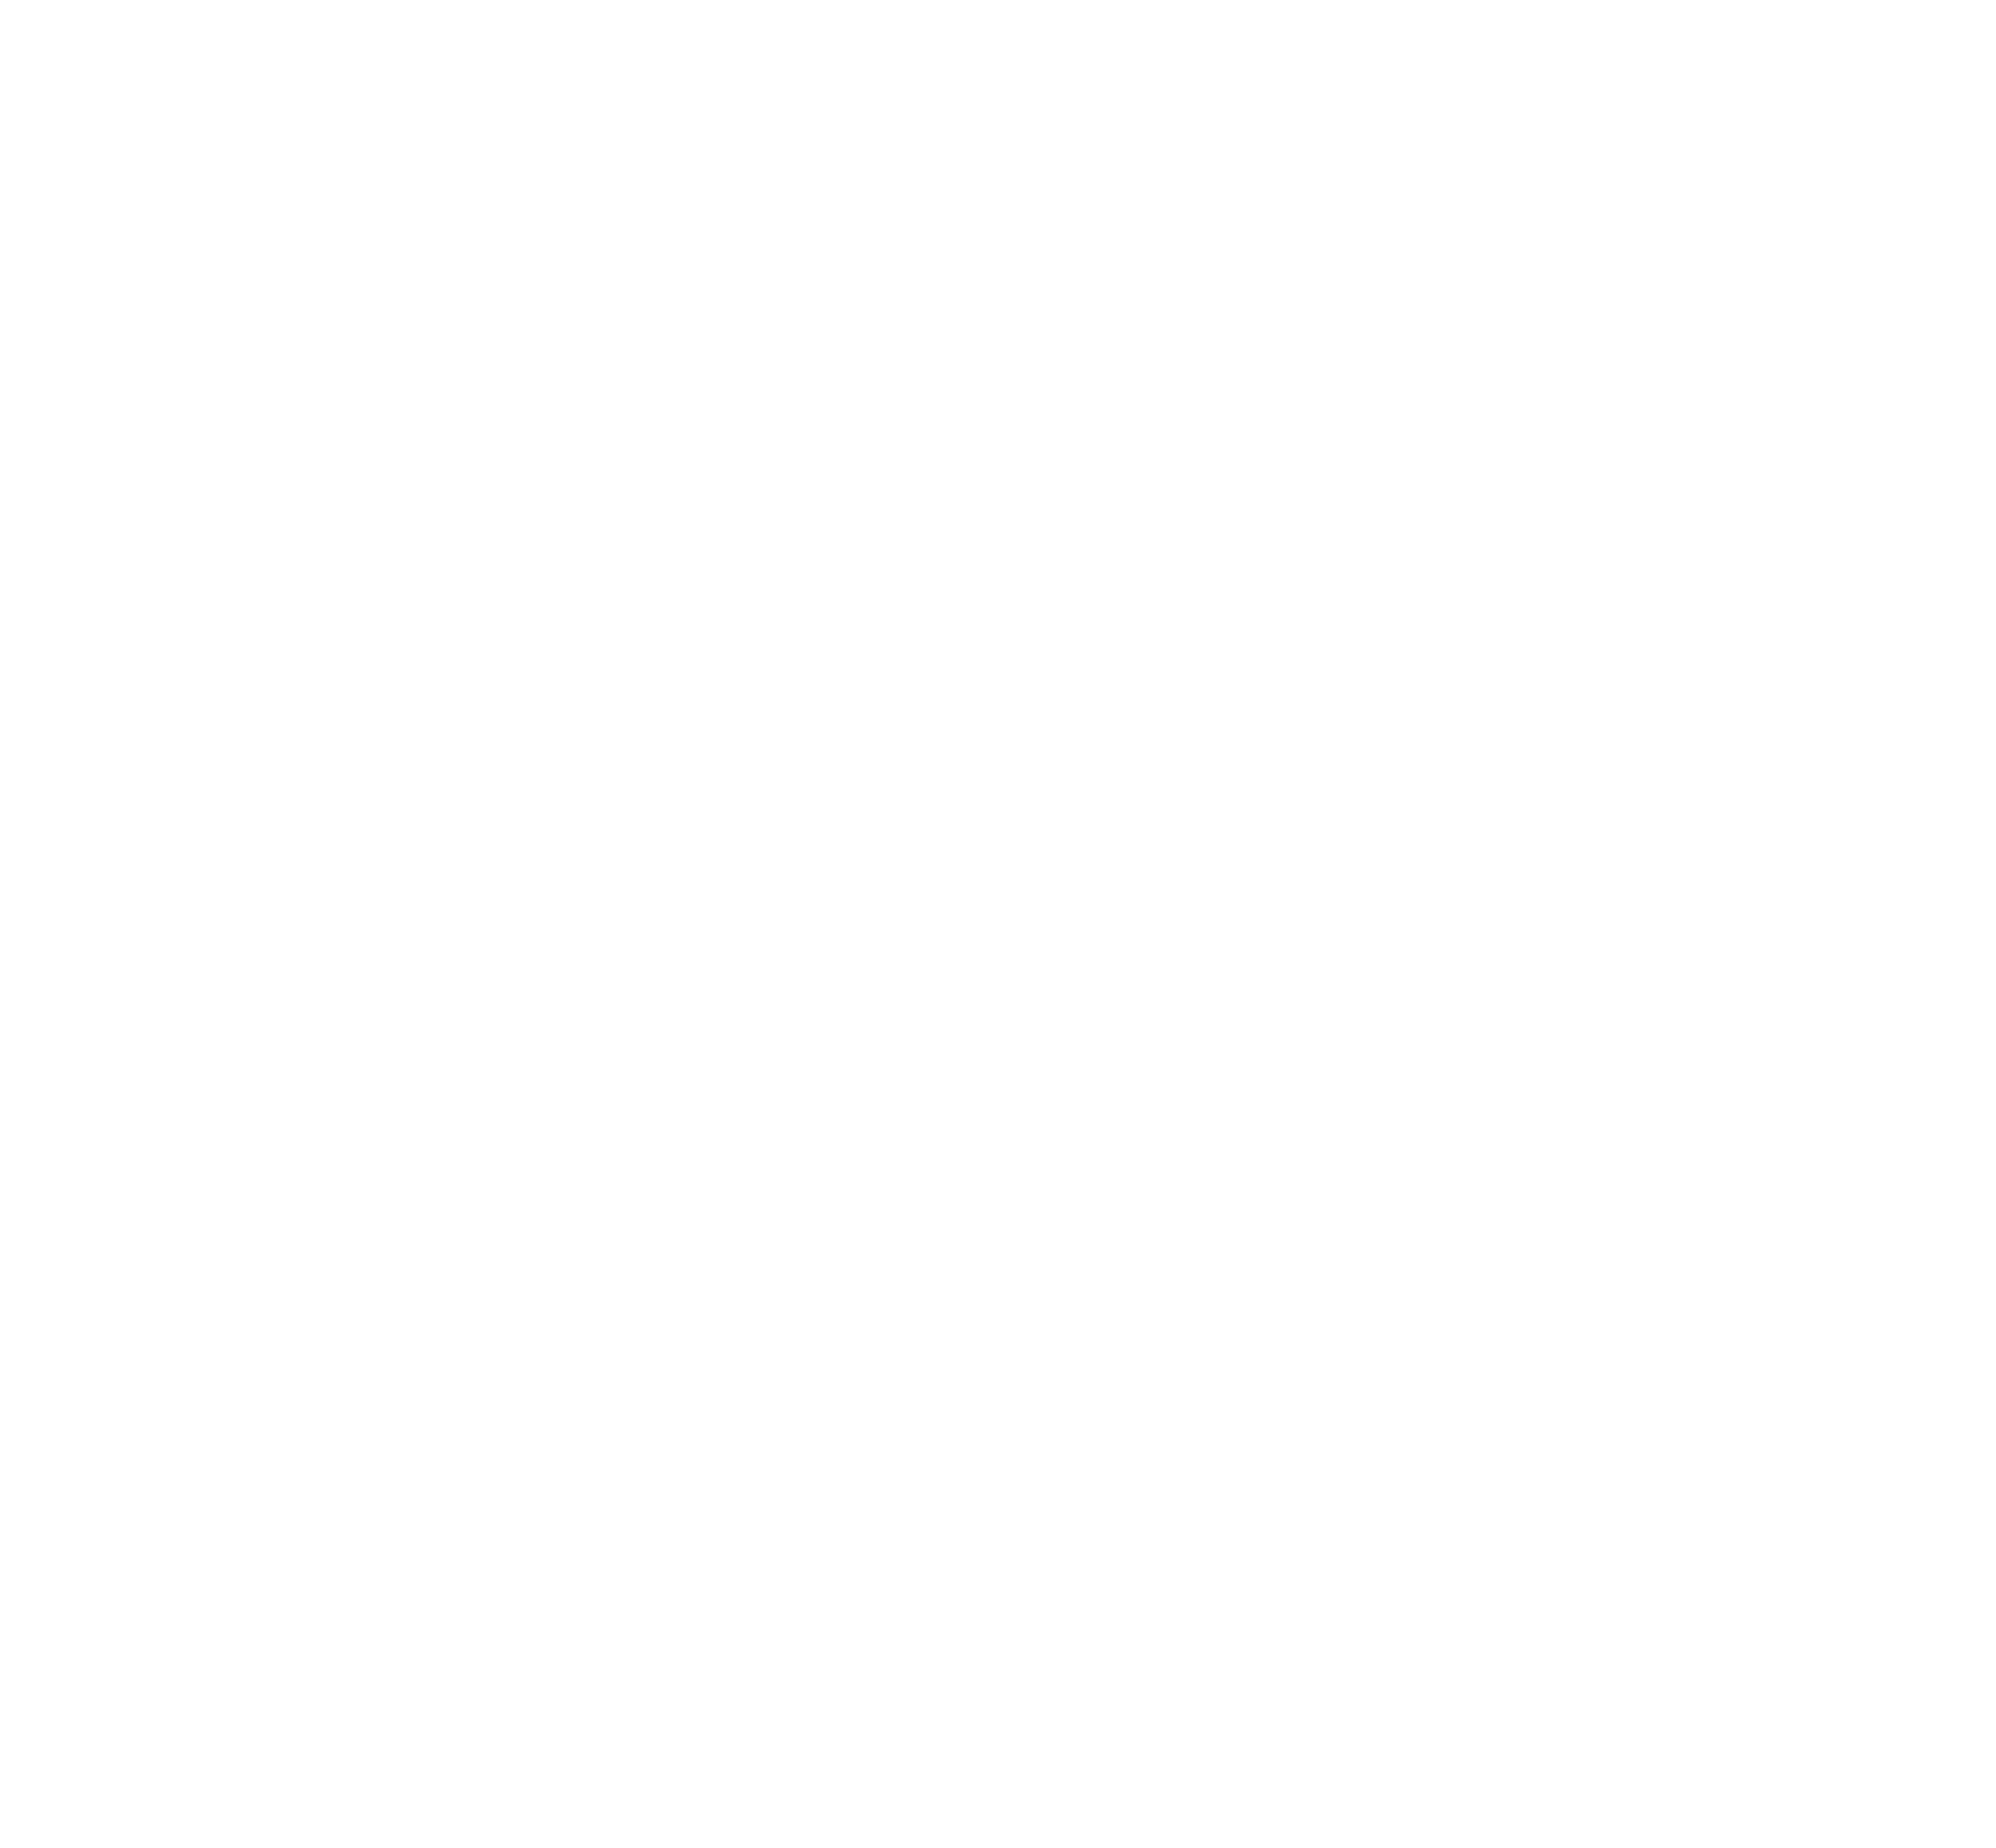 Home Renovation Company Needing Help With Logo Redesign